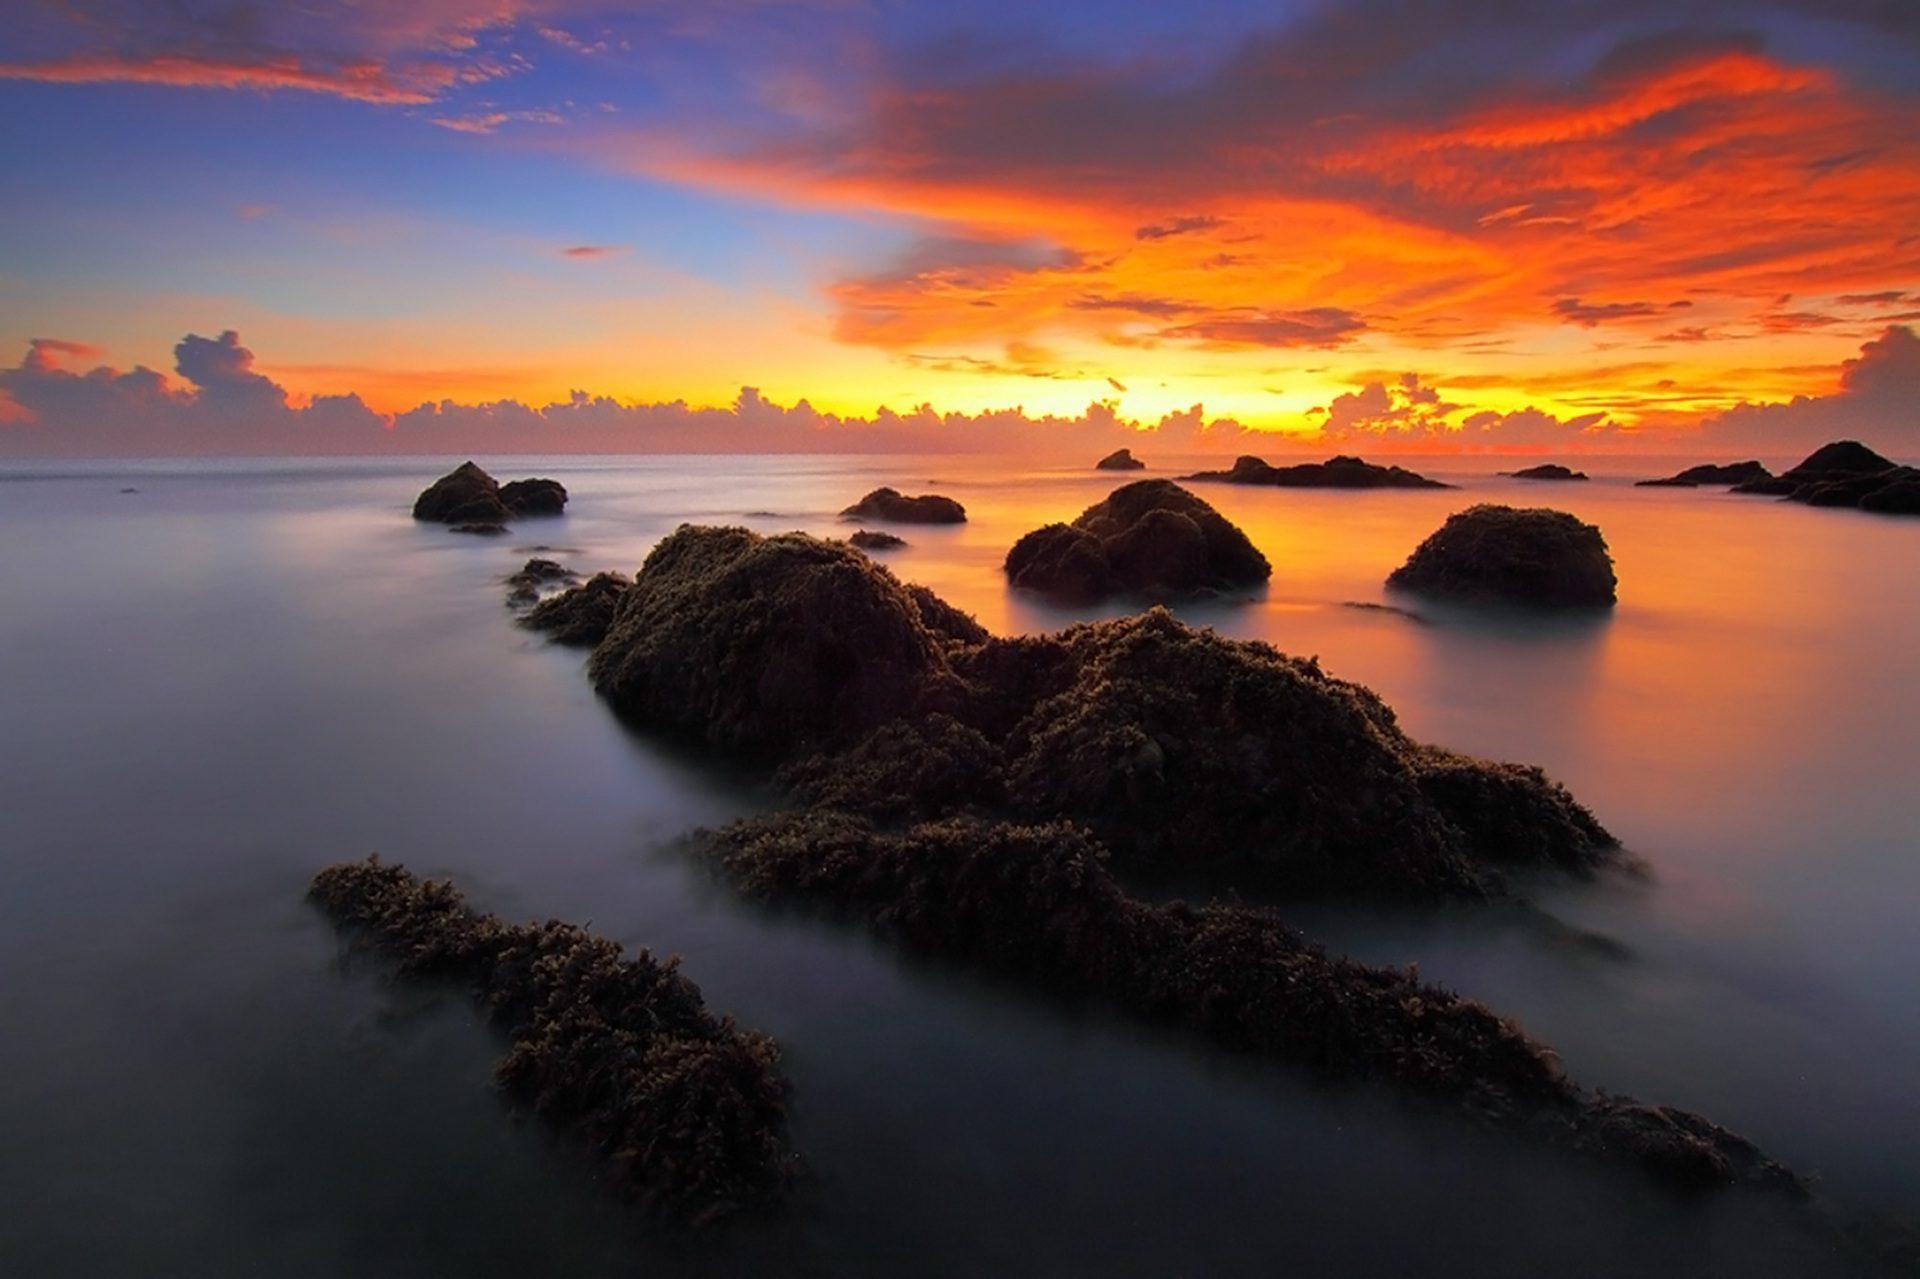 Rocas, झील, सागर, पत्थर, कोहरा, आकाश, सूर्यास्त - HD वॉलपेपर - प्रोफेसर-falken.com